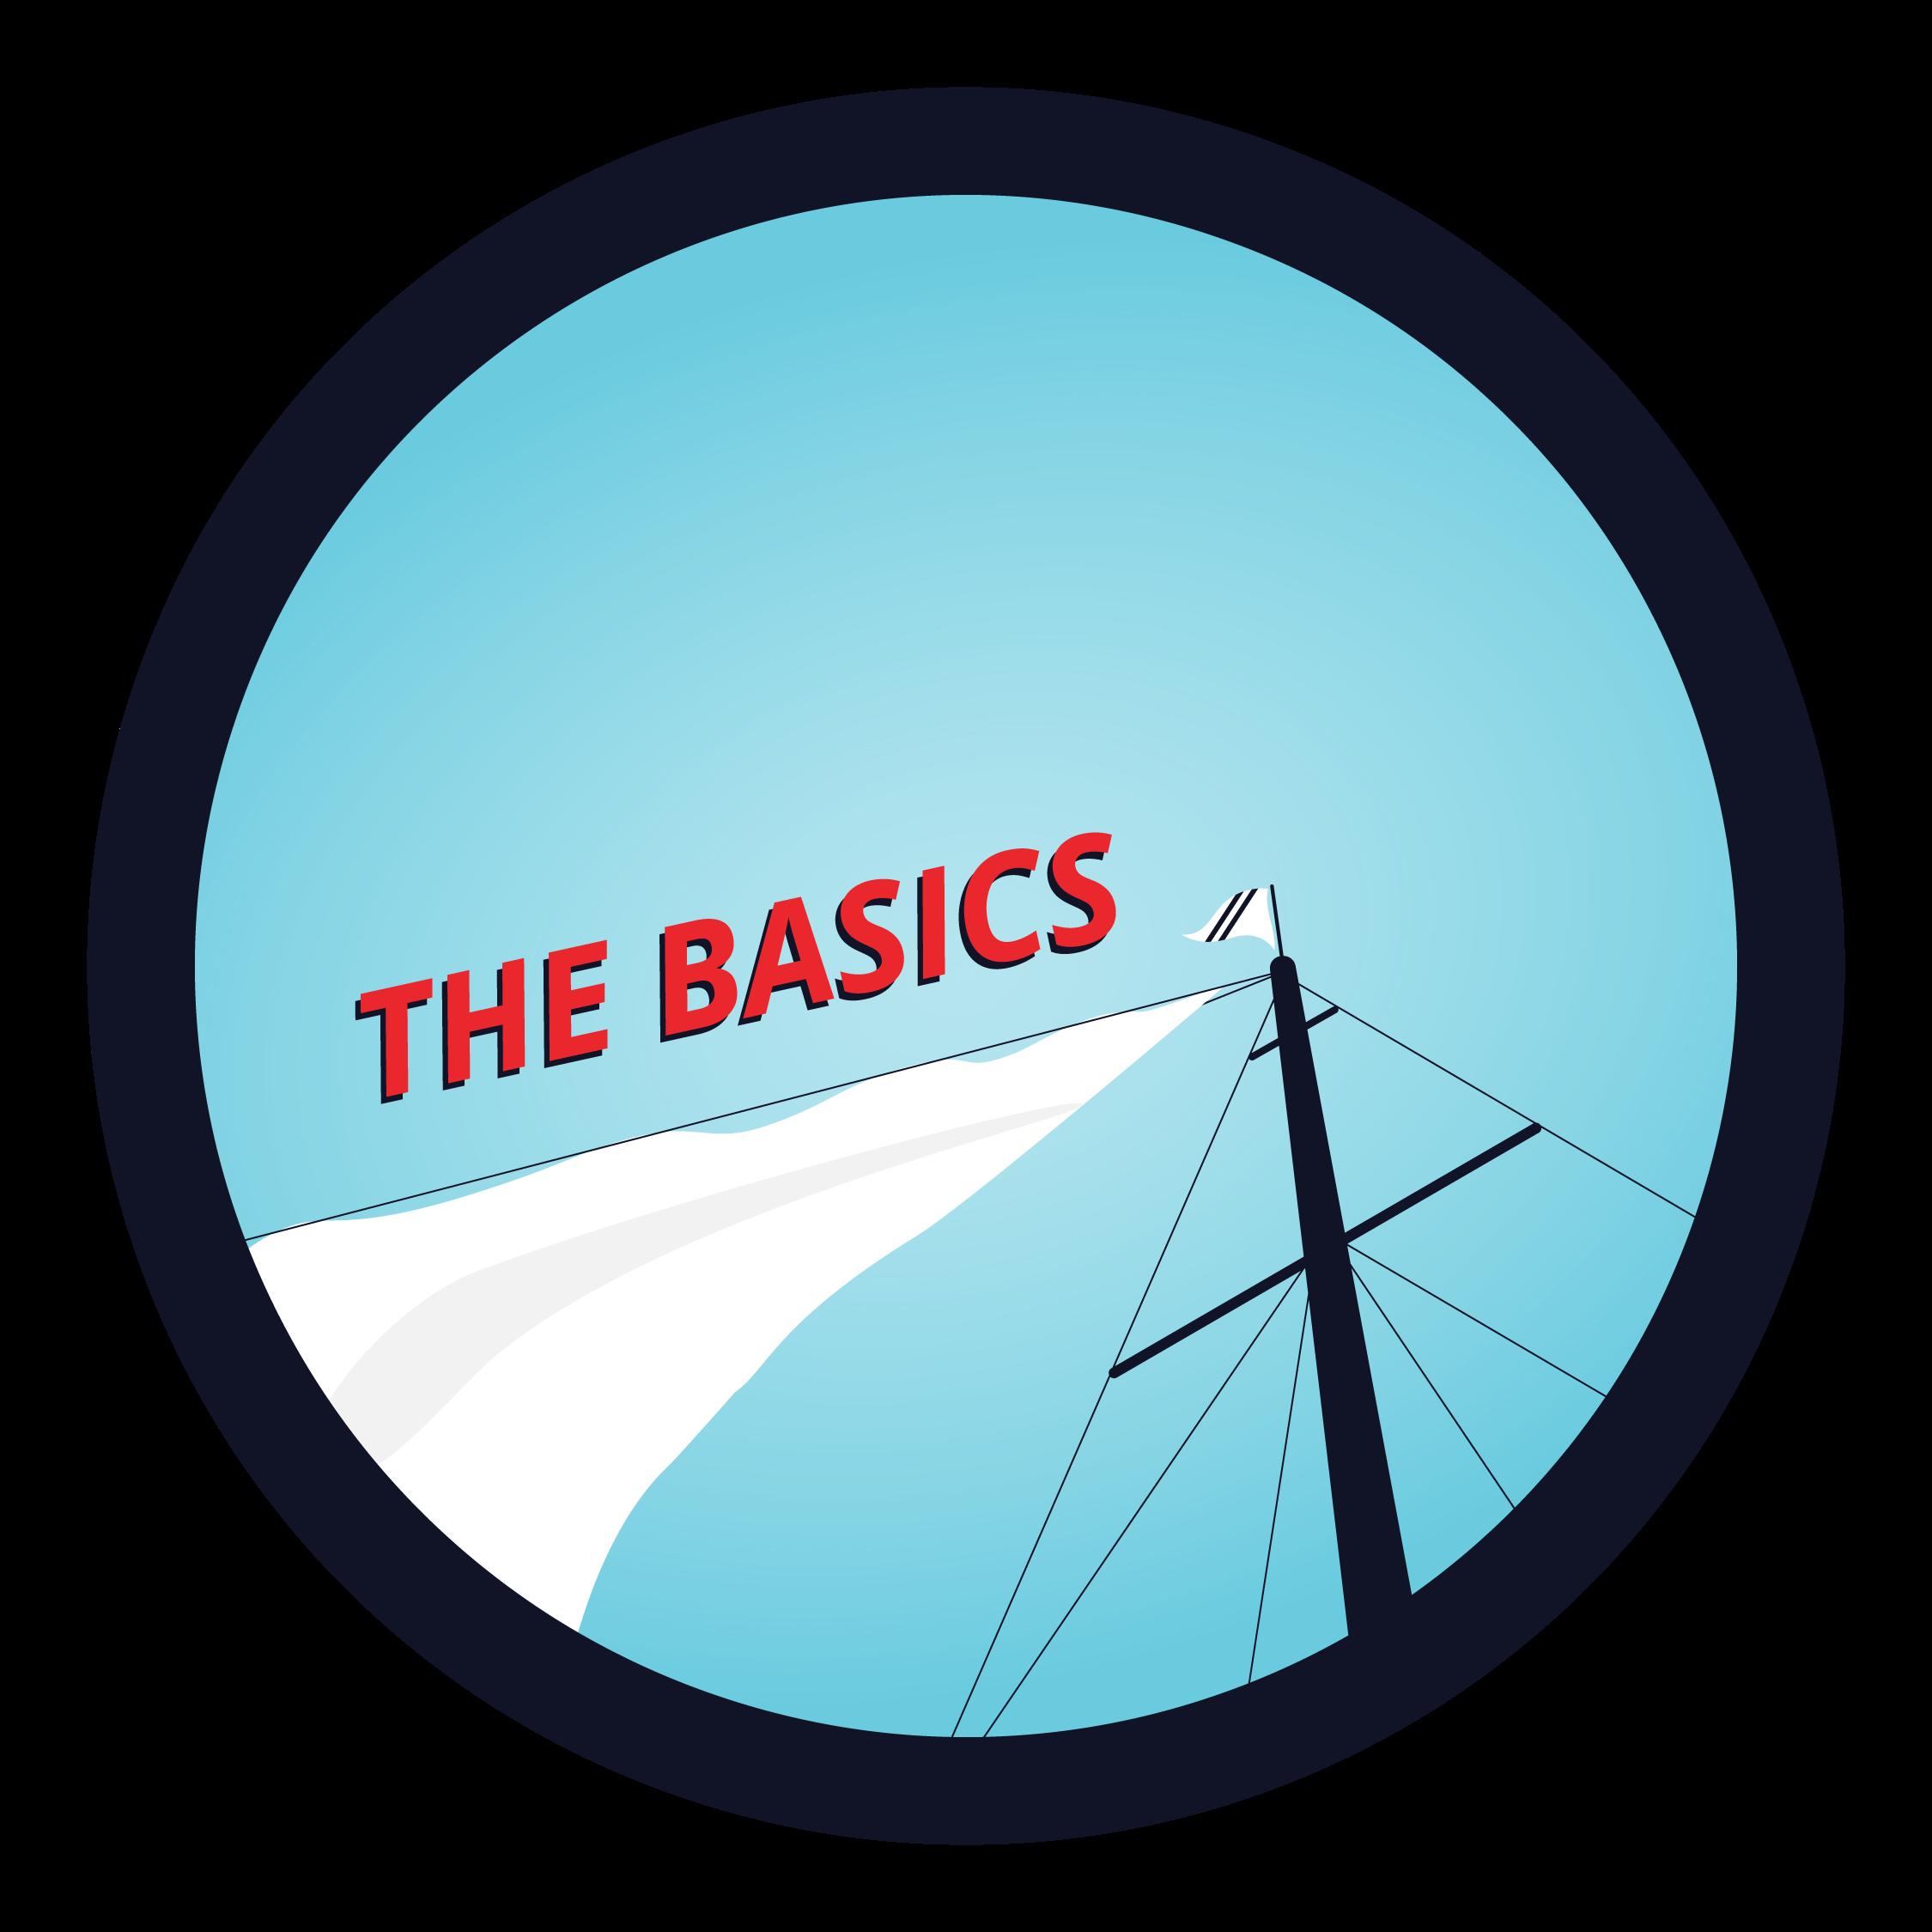 Dockwa_Learn_TheBasics_A